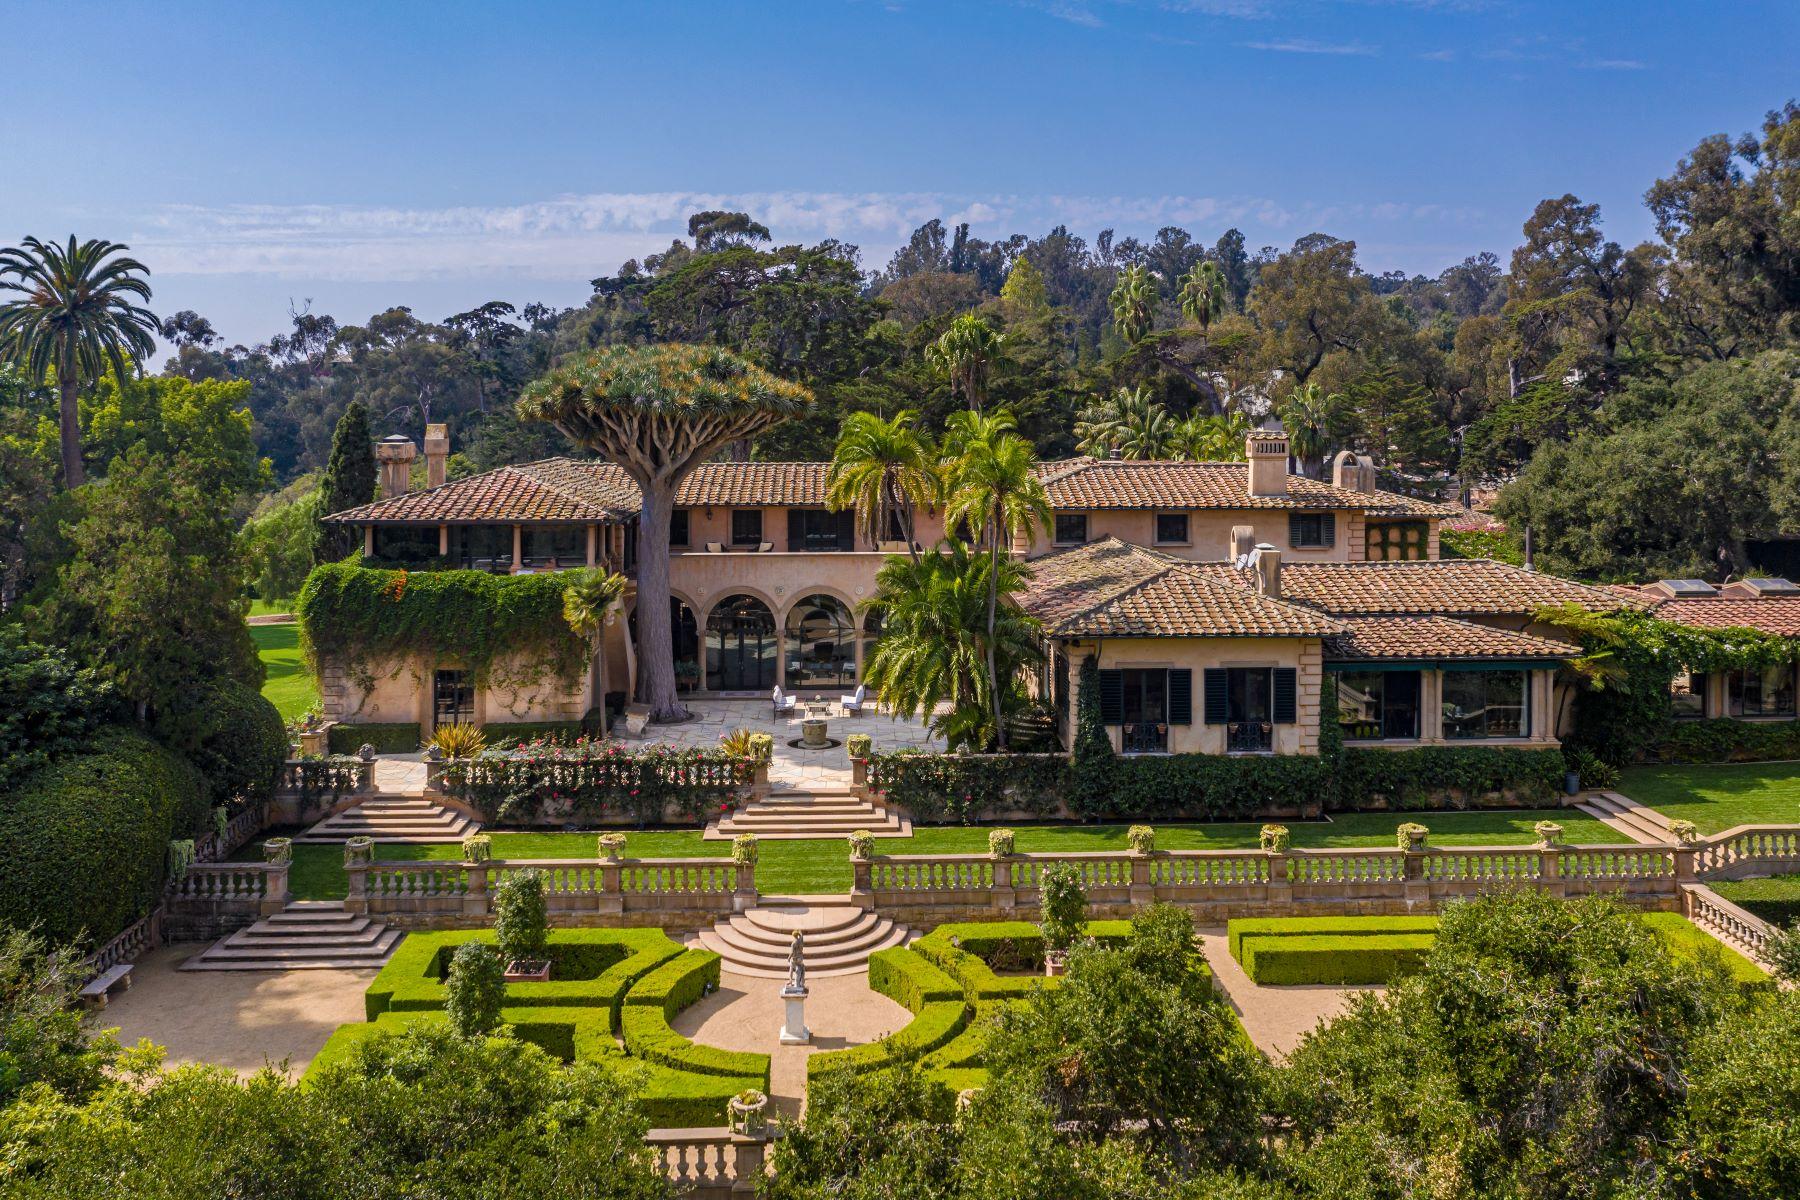 Single Family Homes for Sale at Sotto il Monte 2845 Sycamore Canyon Road Montecito, California 93108 United States